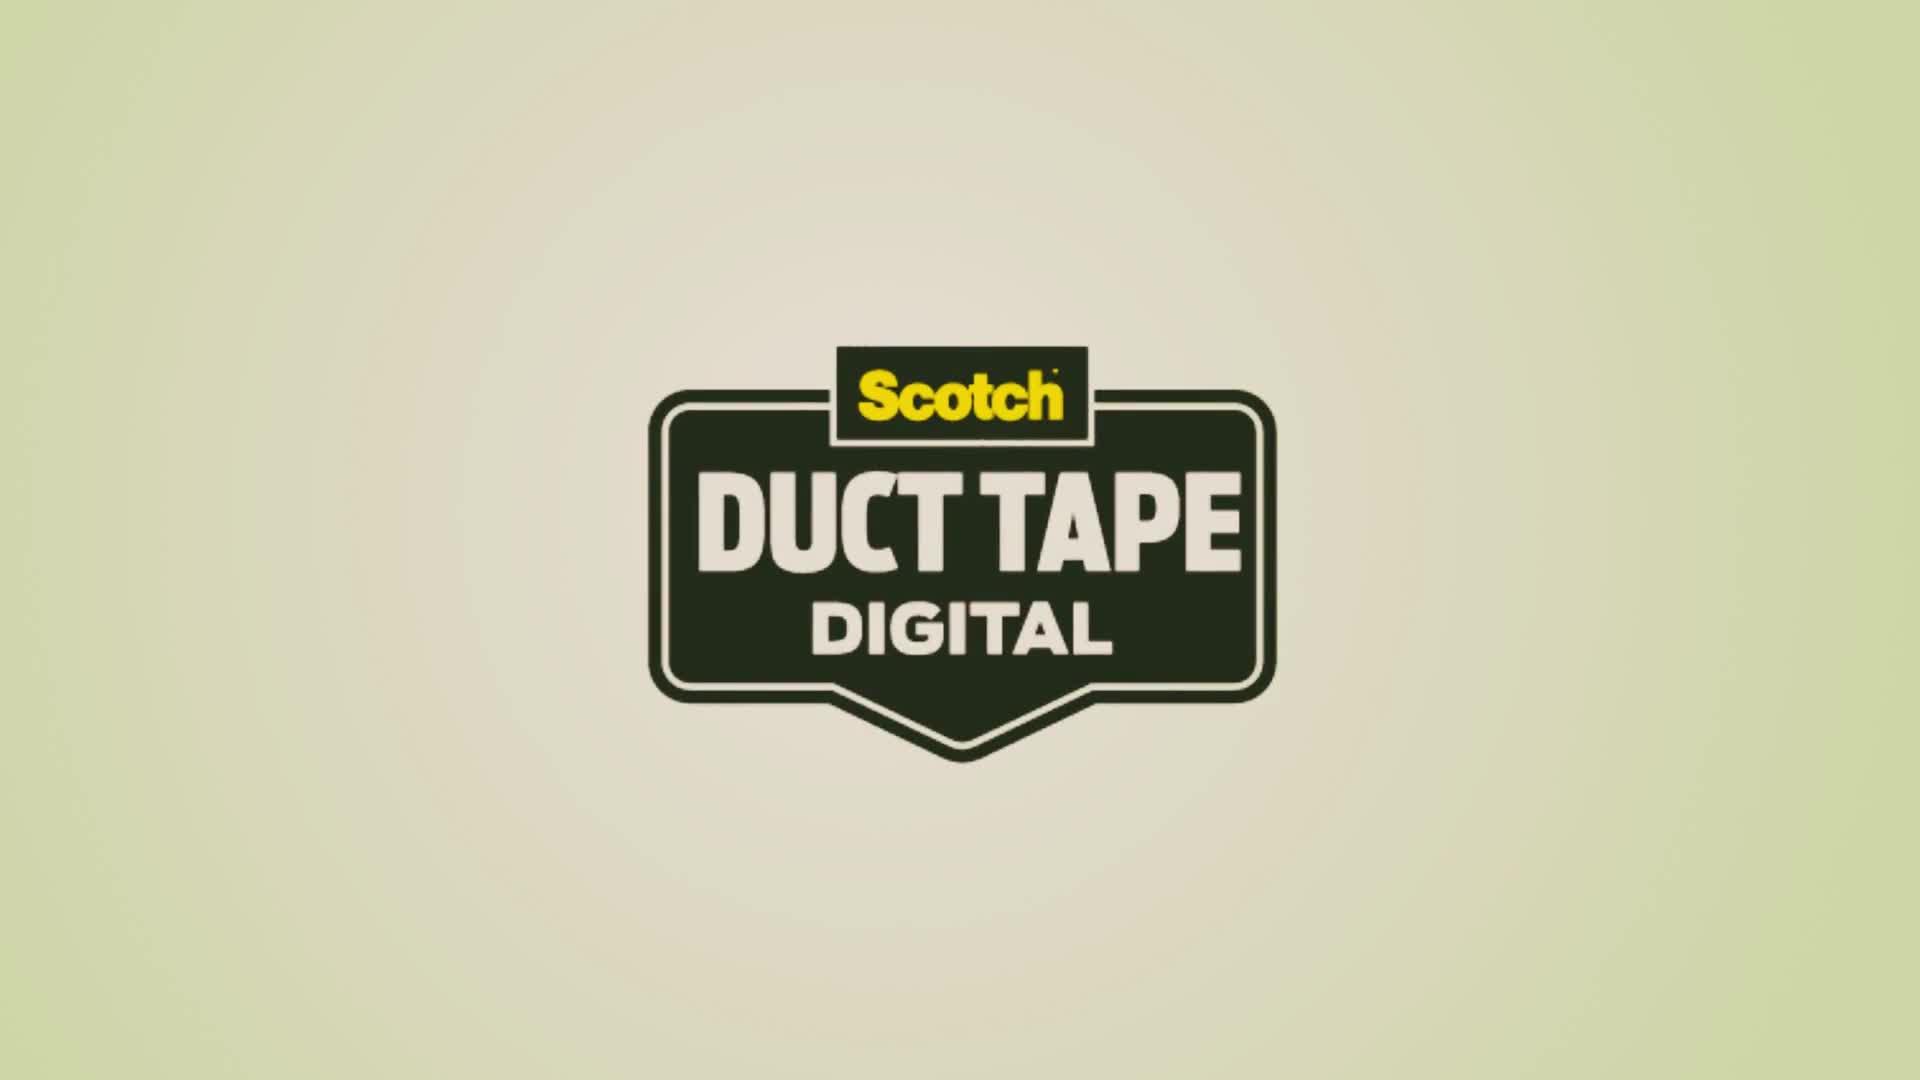 scotch-tape-duct-tape-digital-600-21120.jpg